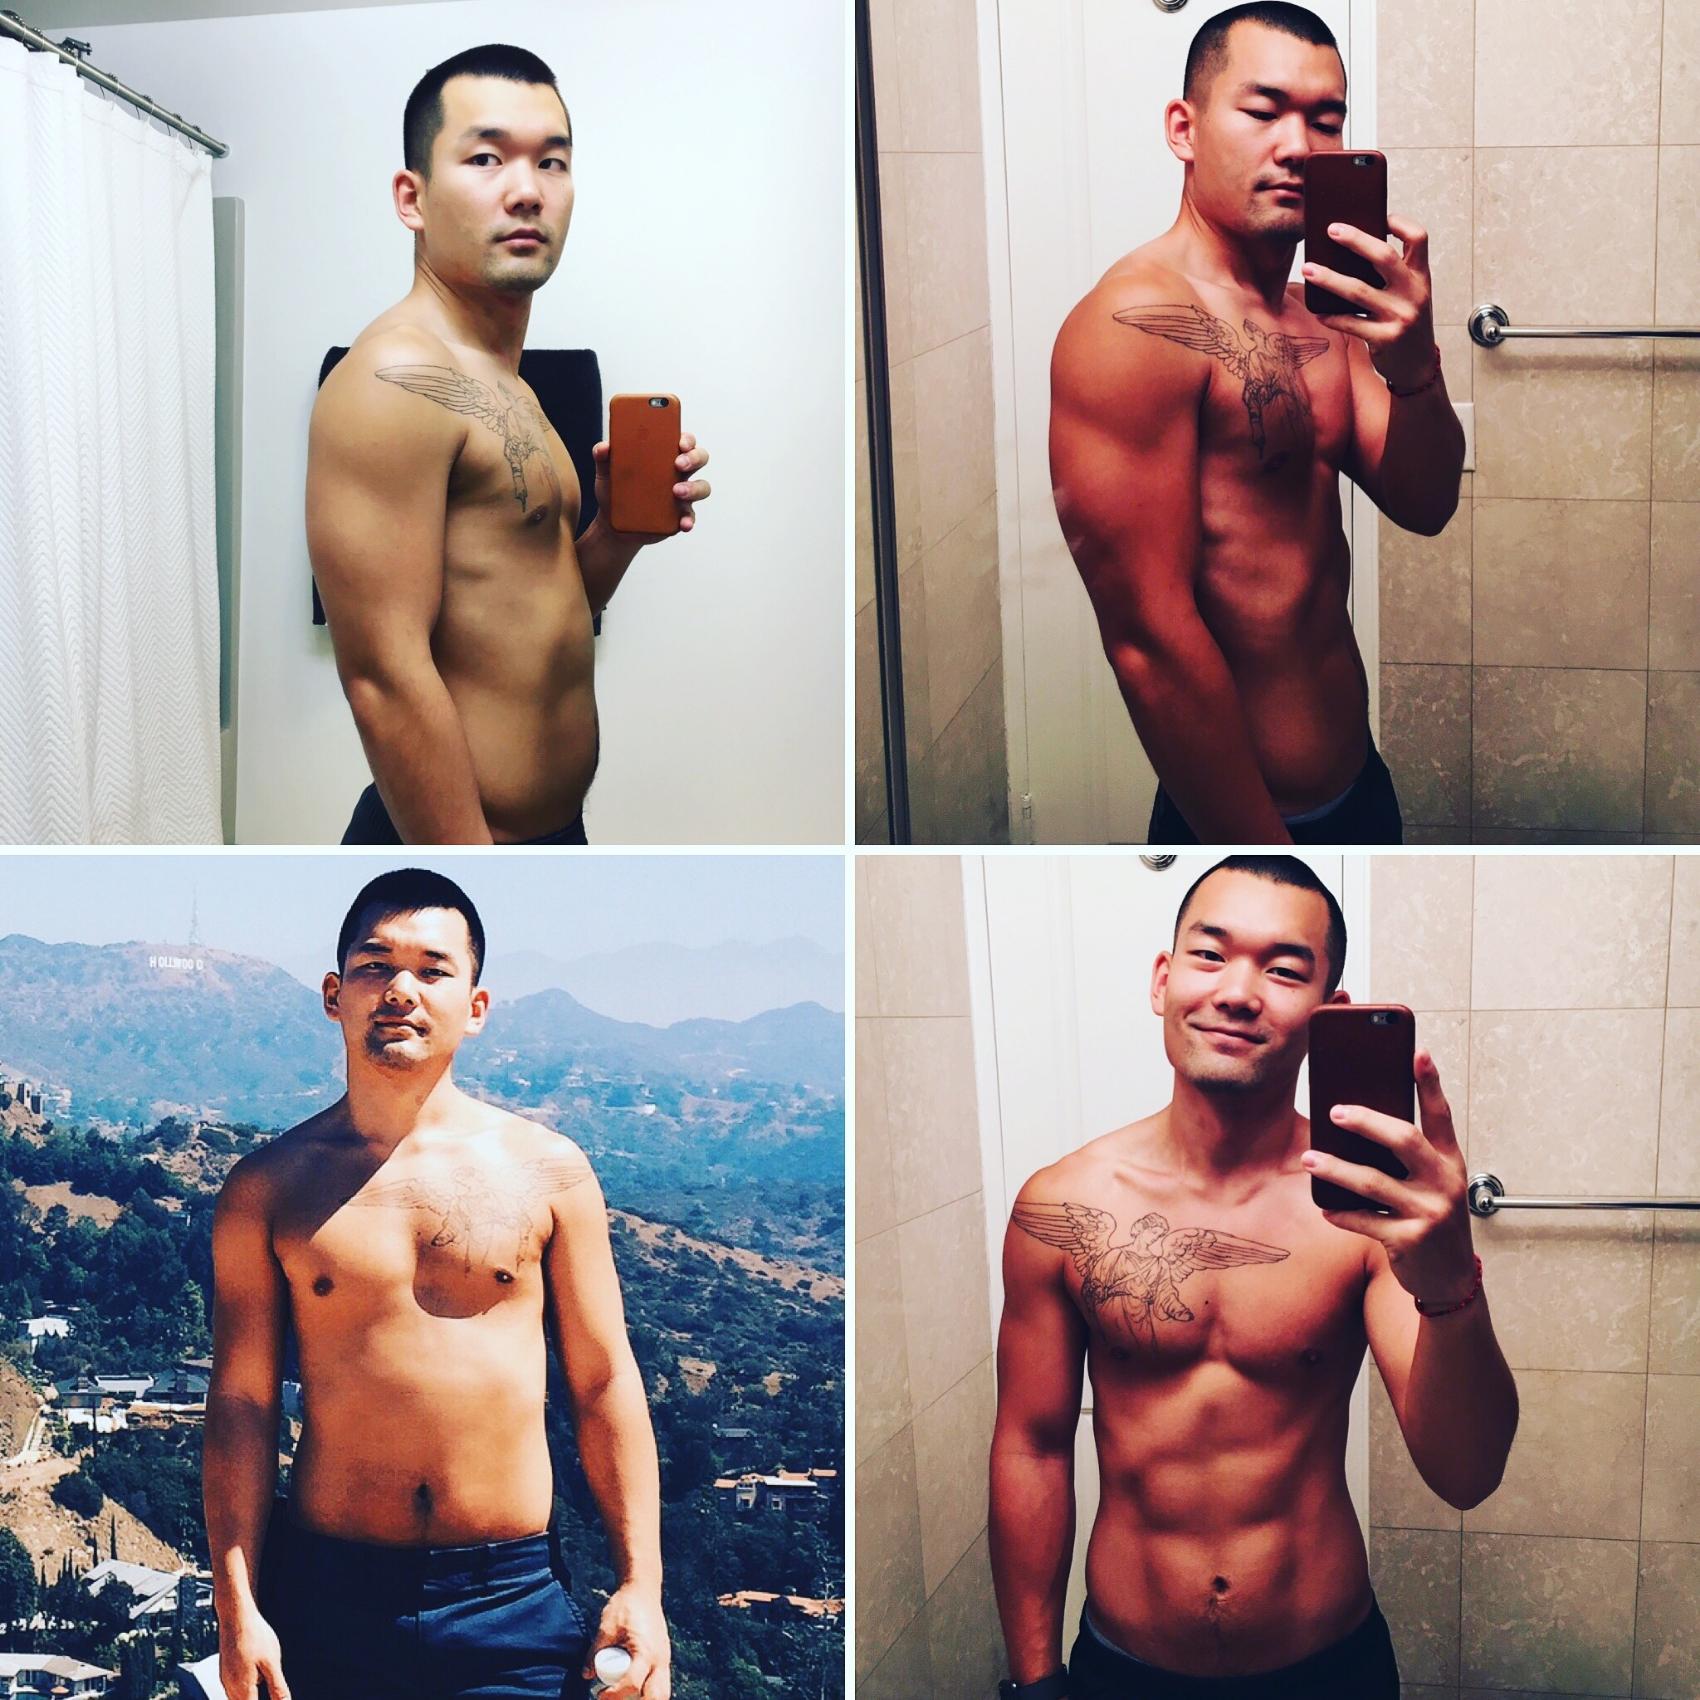 25 lbs of body fat -->9.5 lbs of body fat